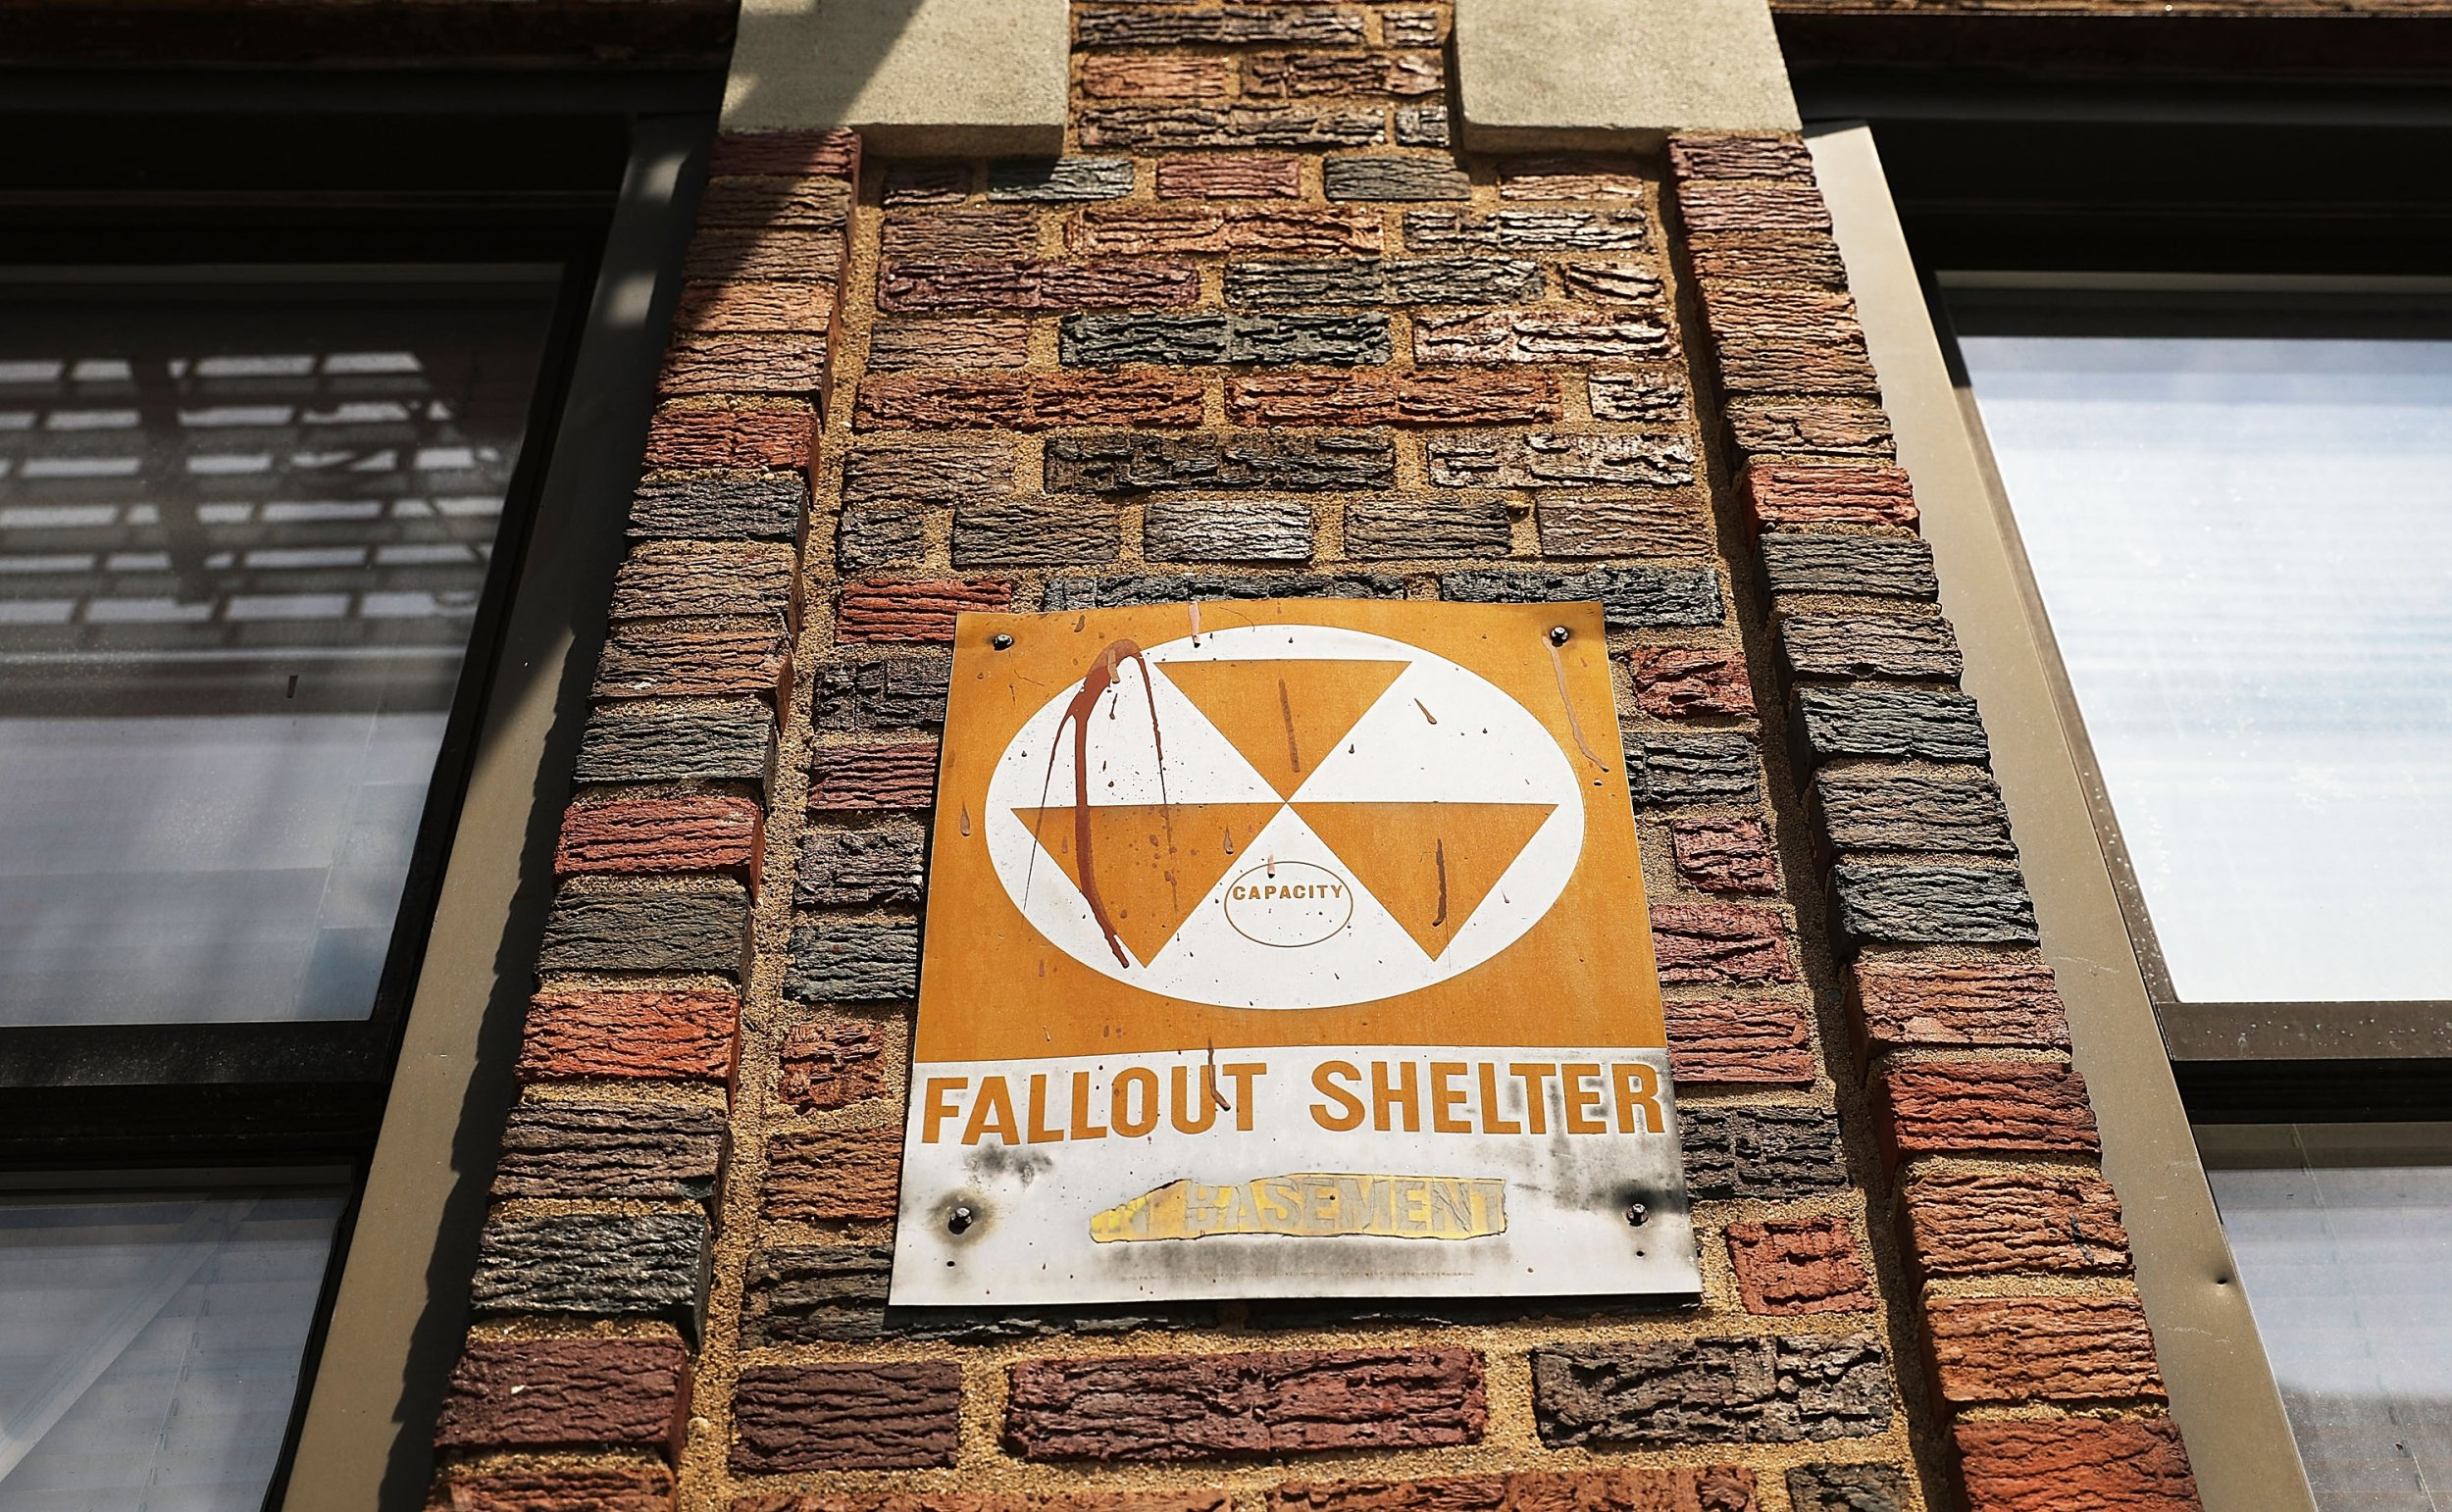 09_19_North_Korea_fallout_shelter